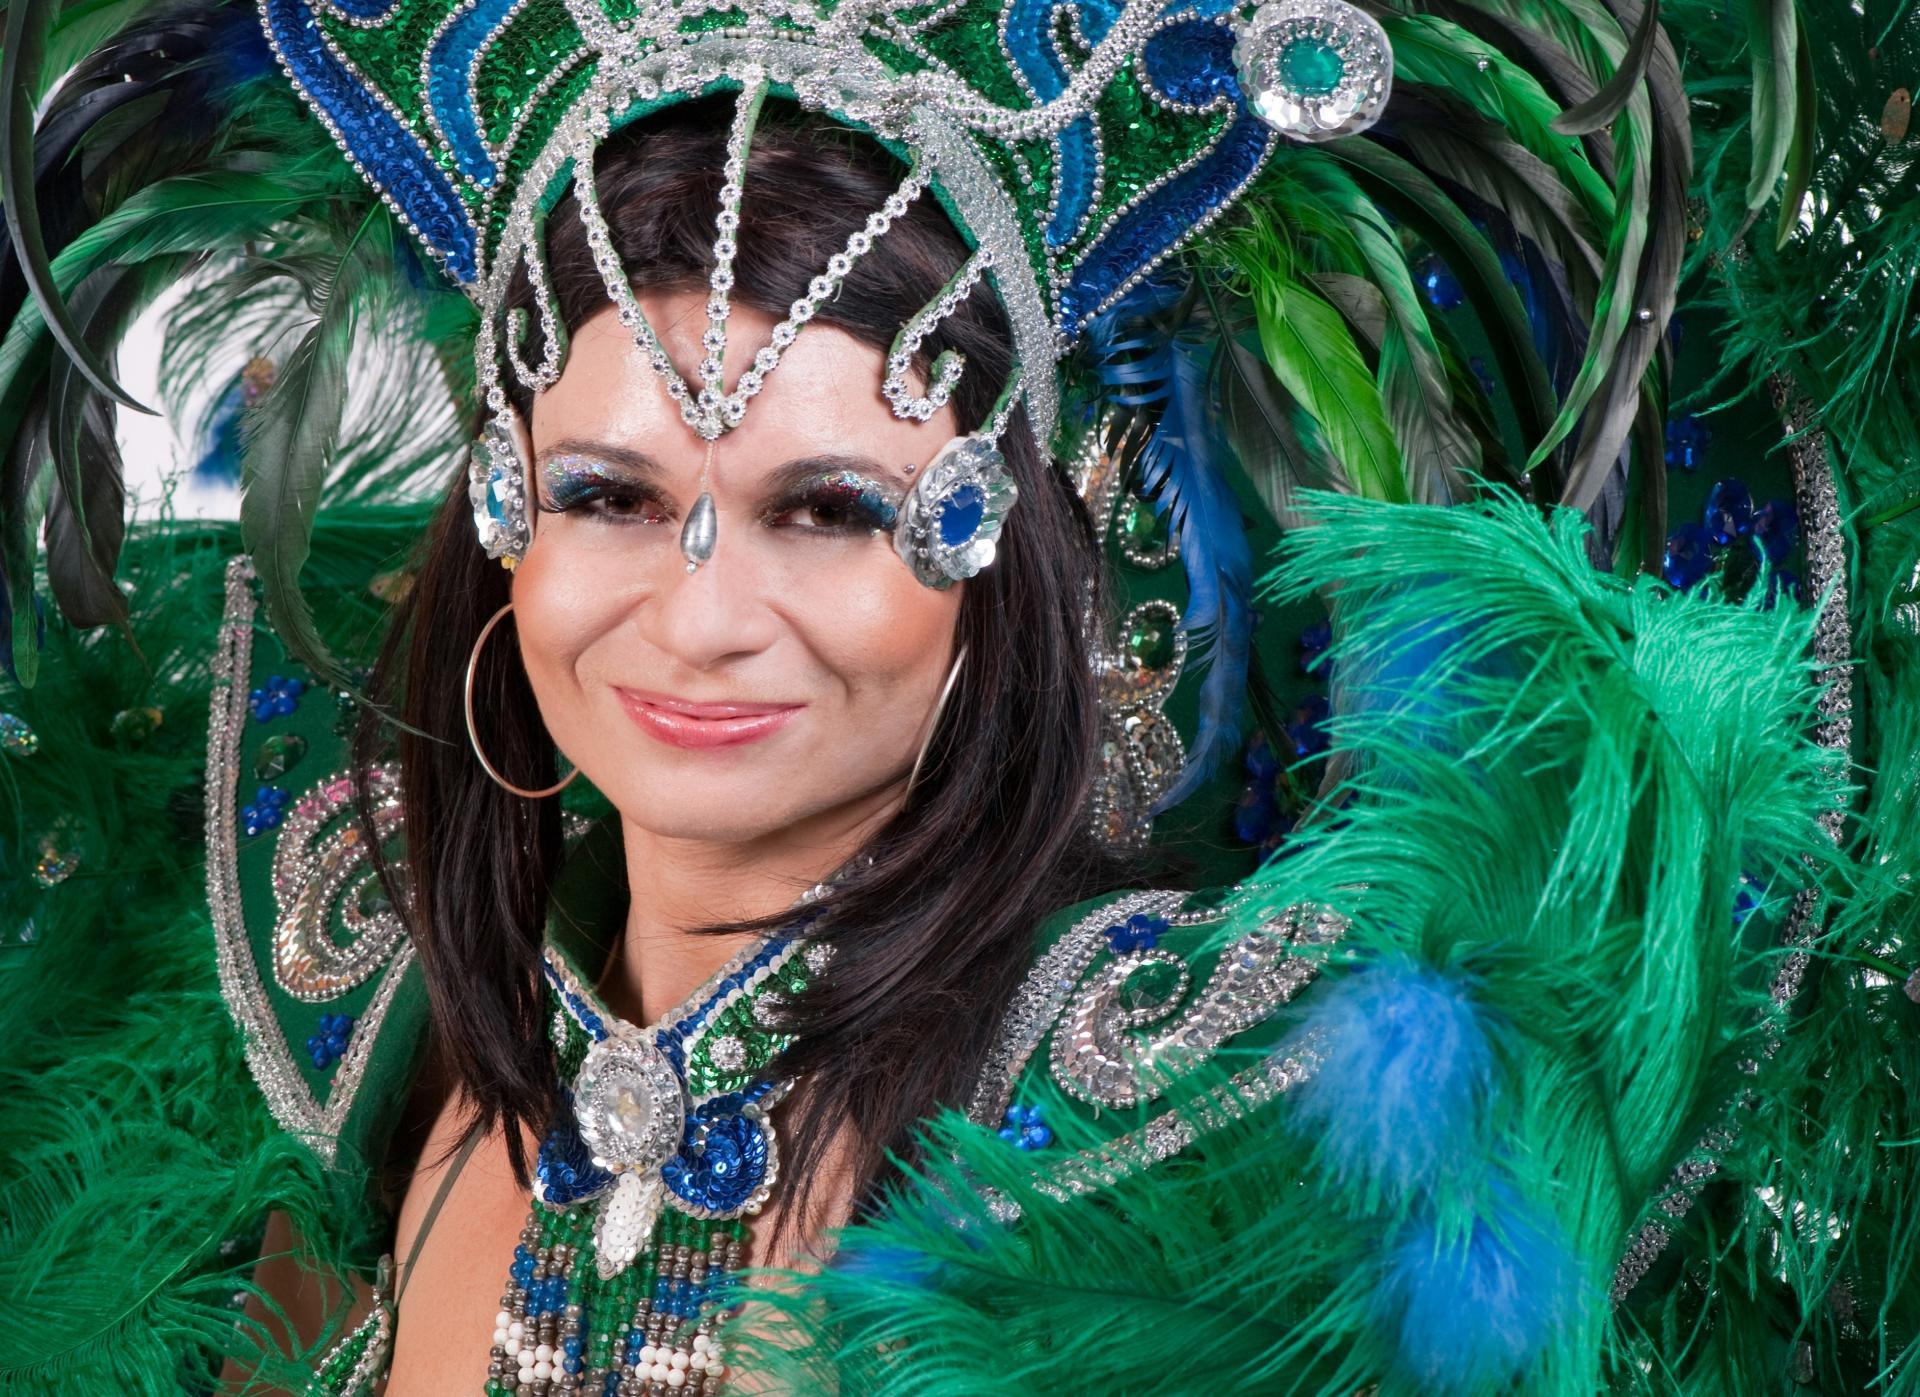 Prachtvoll verkleidete Sambatänzerin in Rio de Janeiro